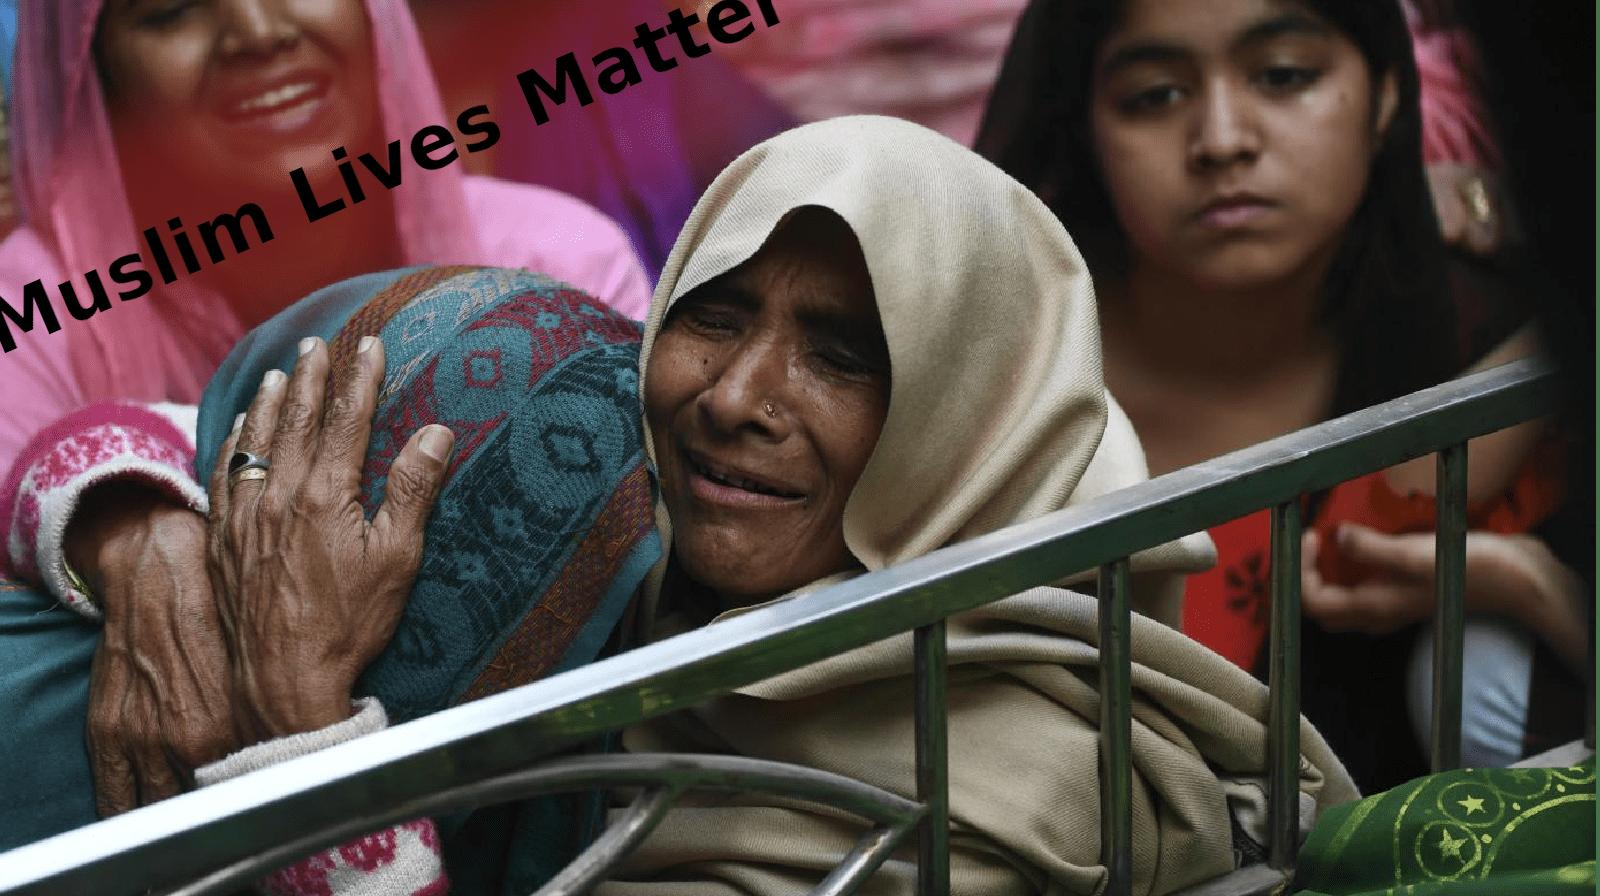 muslim live matter